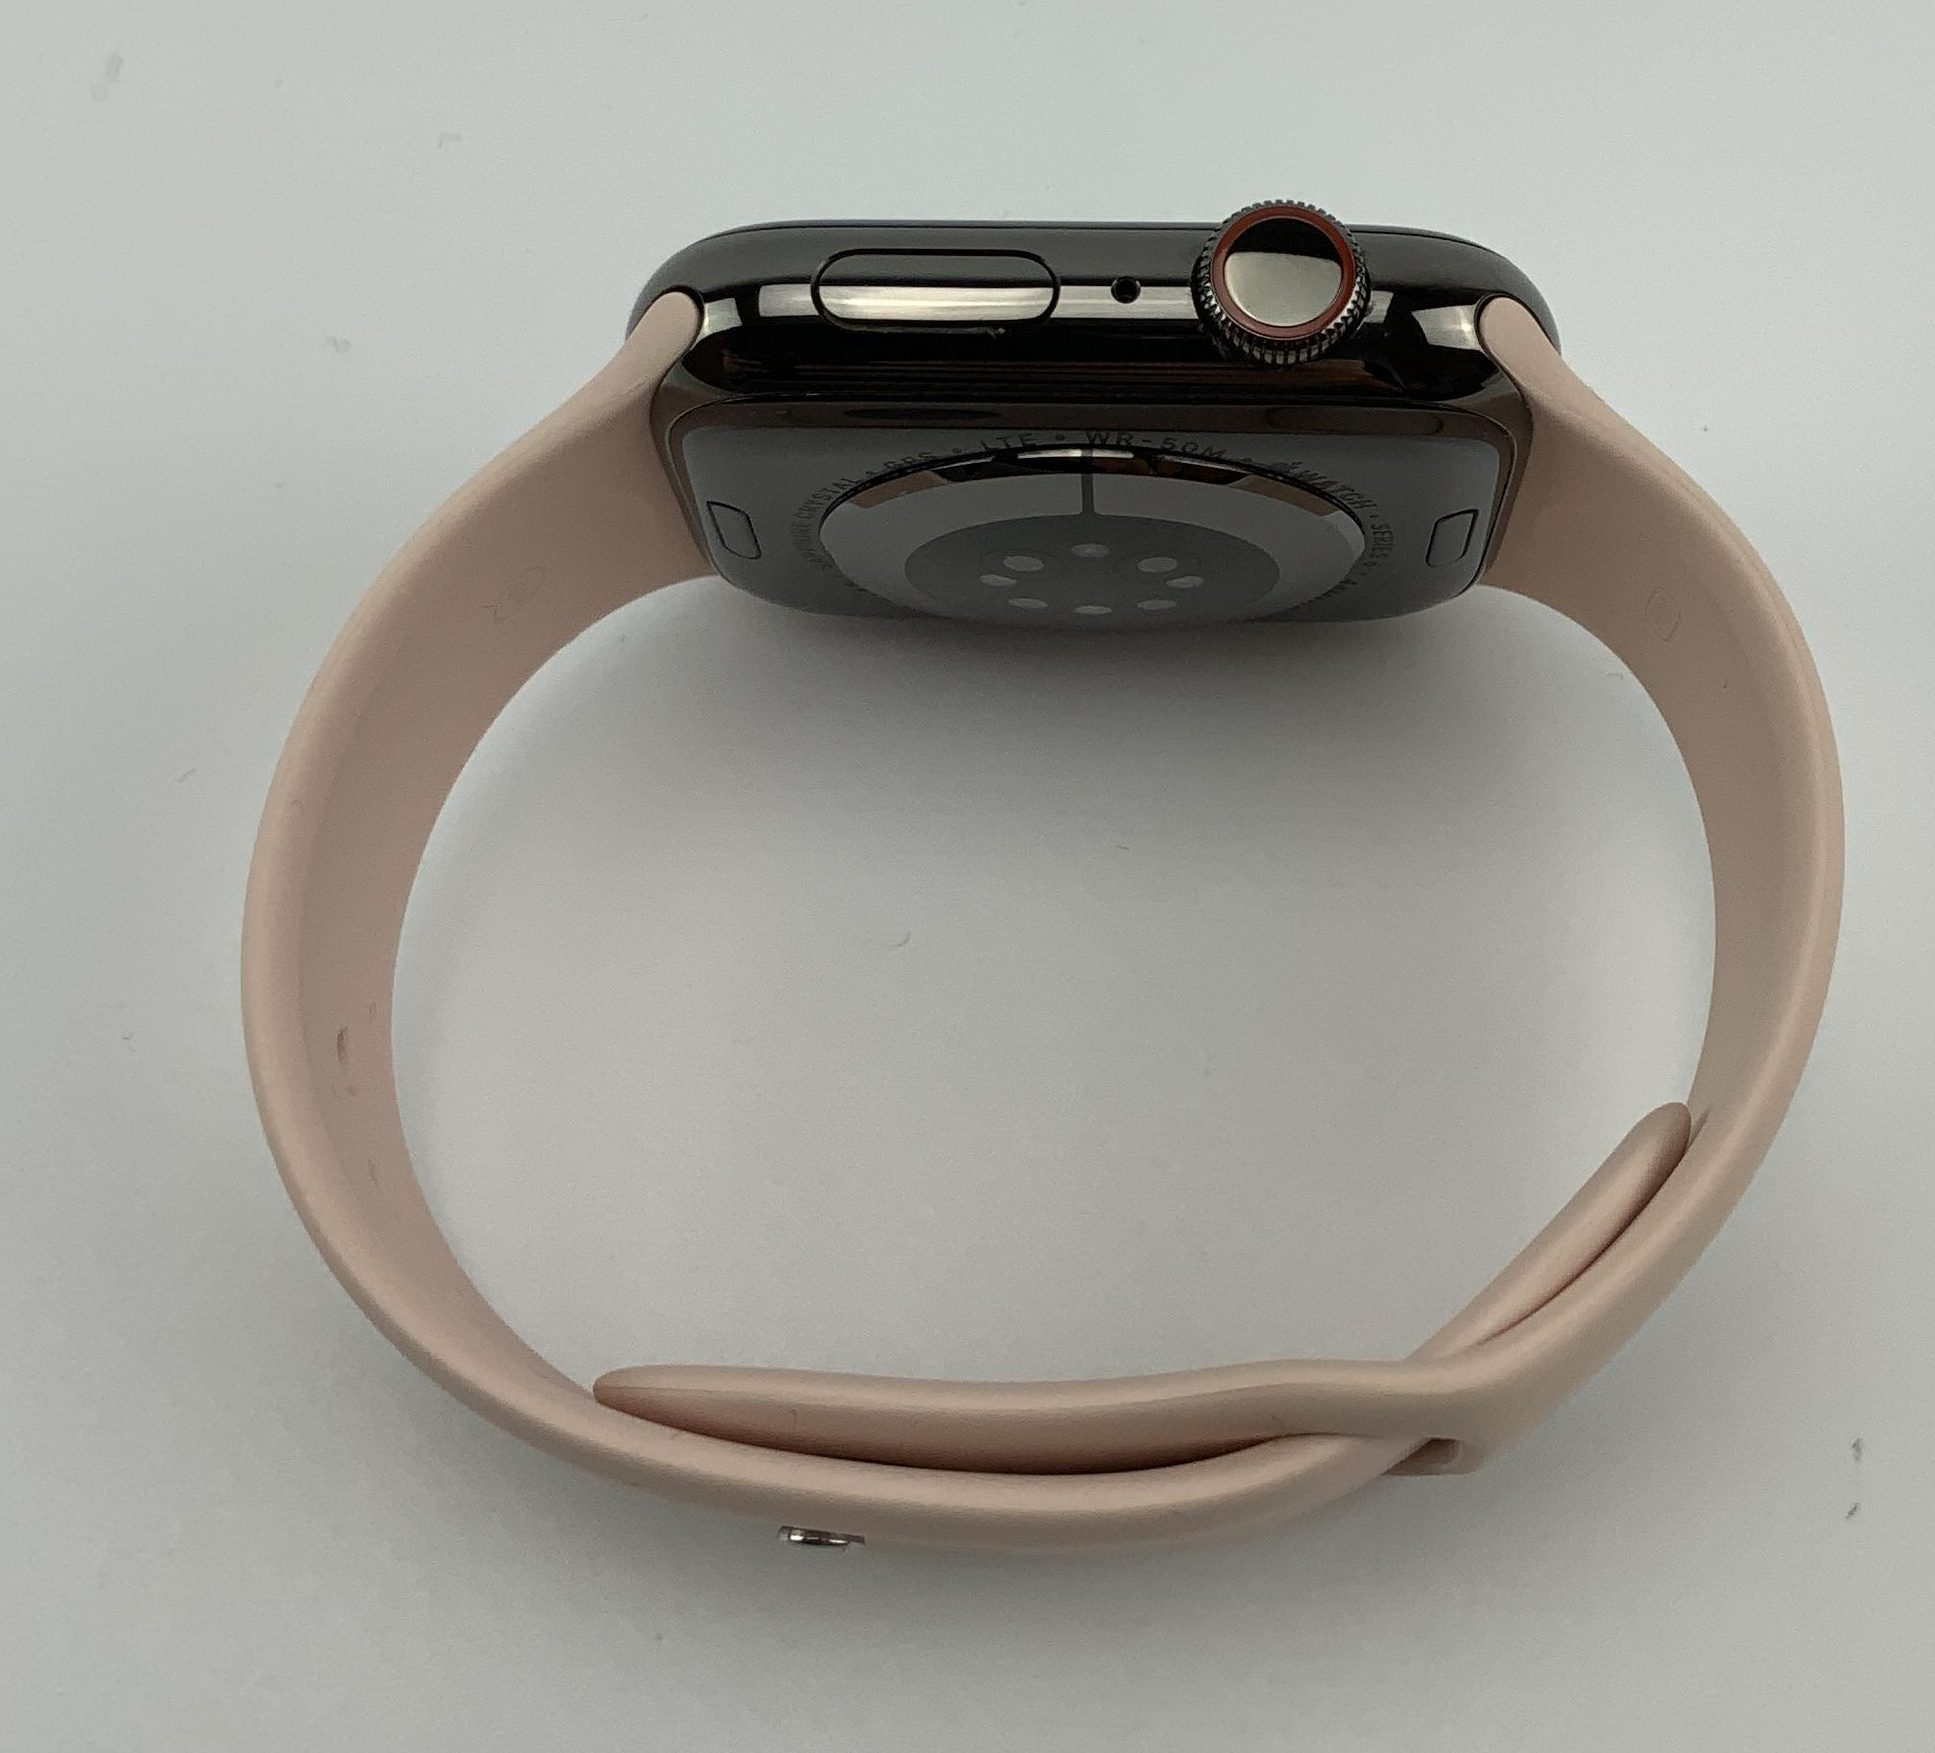 Watch Series 6 Steel Cellular (44mm), Graphite, image 2